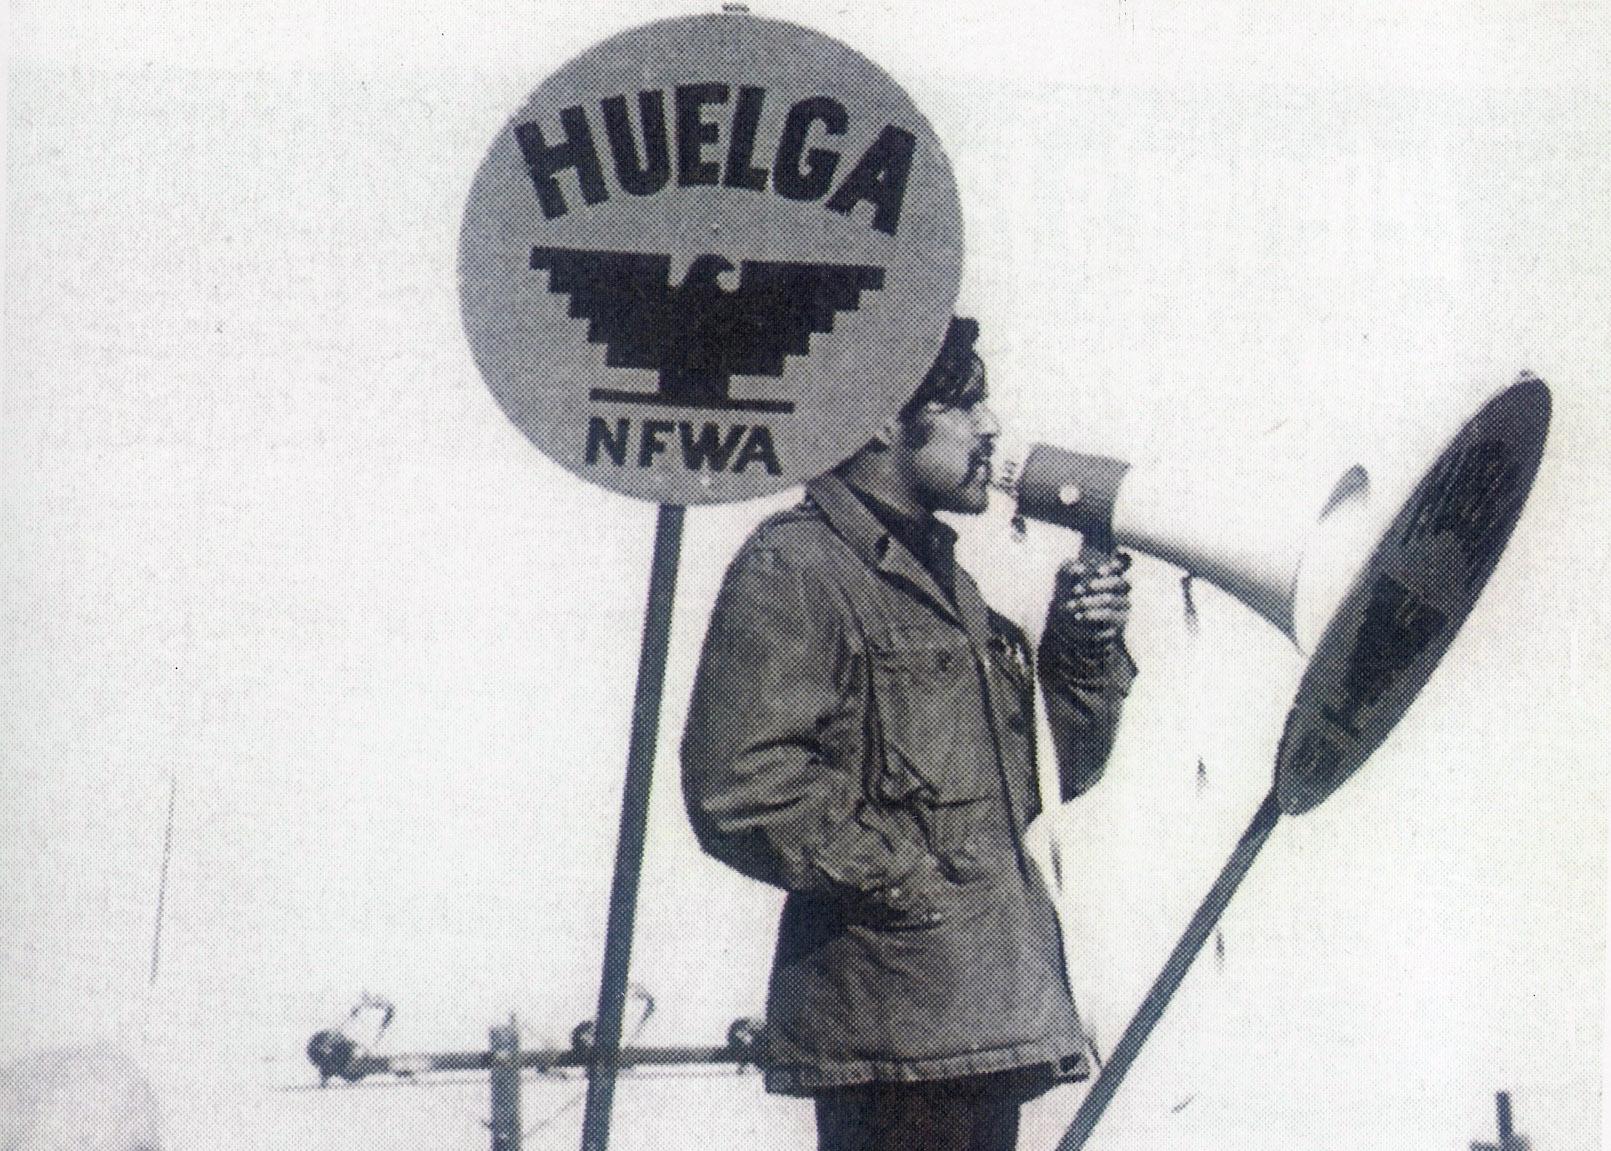 Luis - Picket Captain, 1965